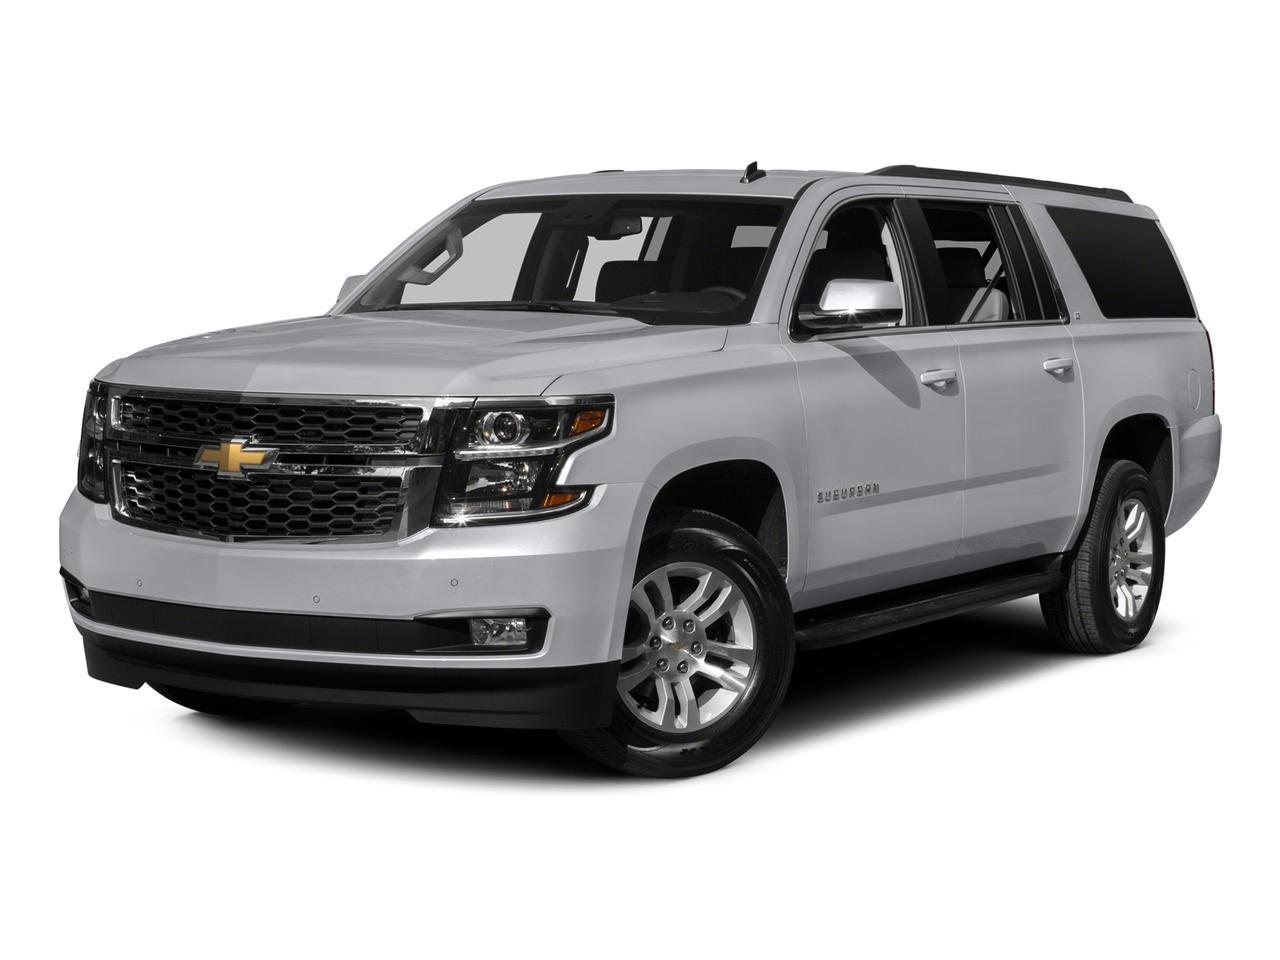 2015 Chevrolet Suburban Vehicle Photo in San Antonio, TX 78254